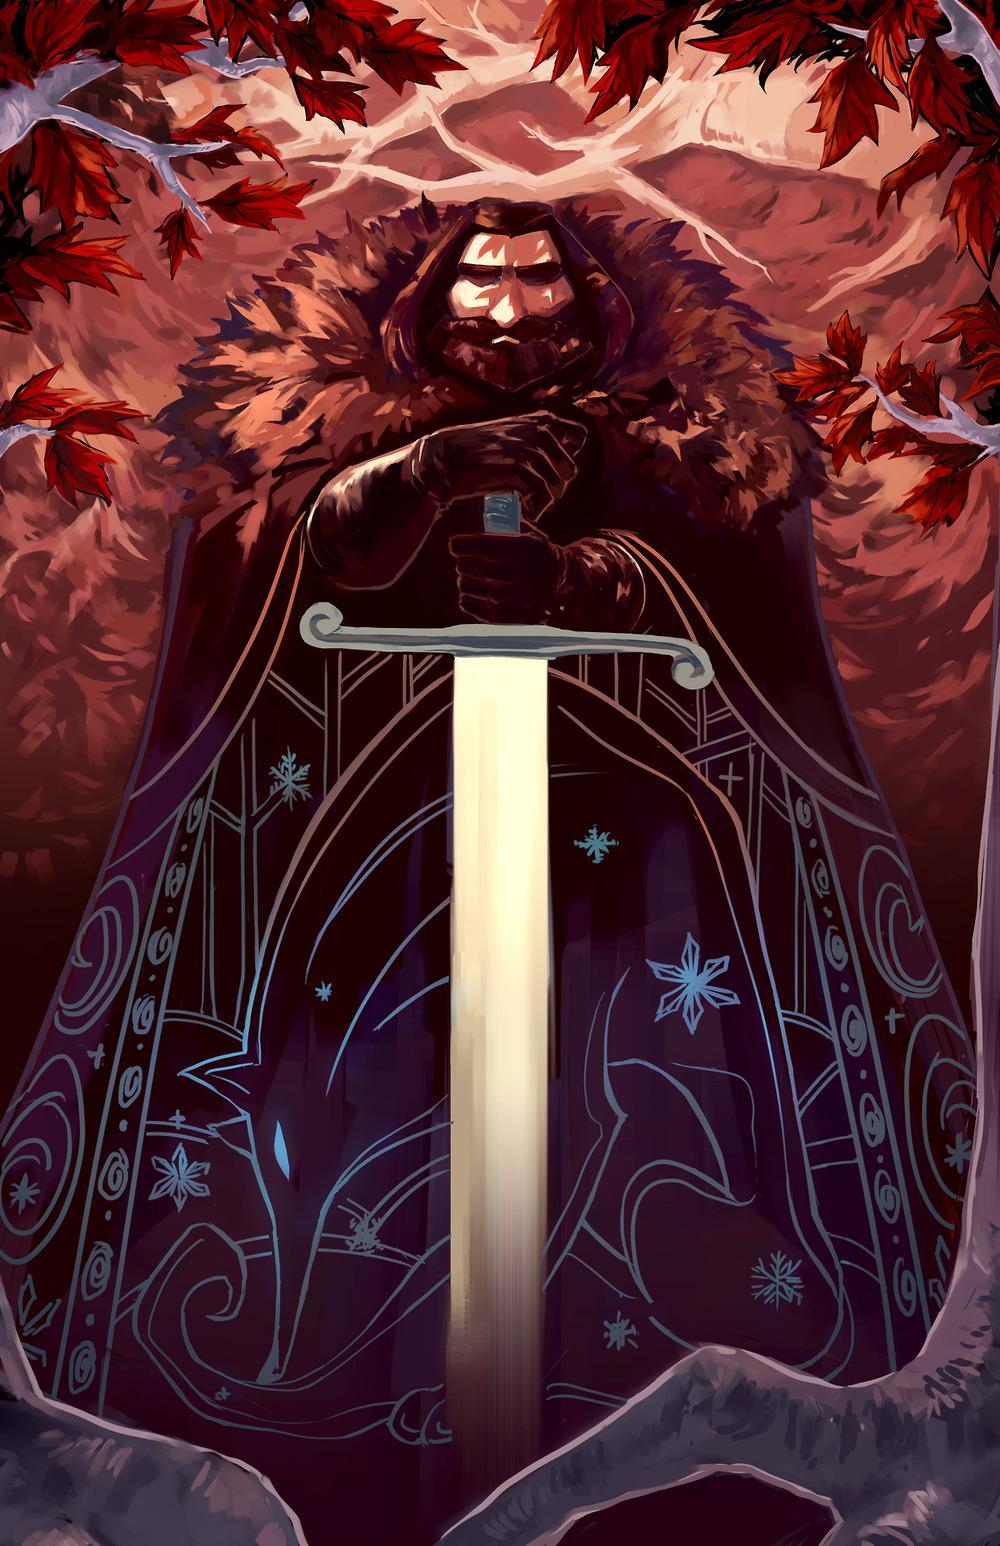 Doodle-Mon-Game-of-Thrones-Ned-Stark.jpg